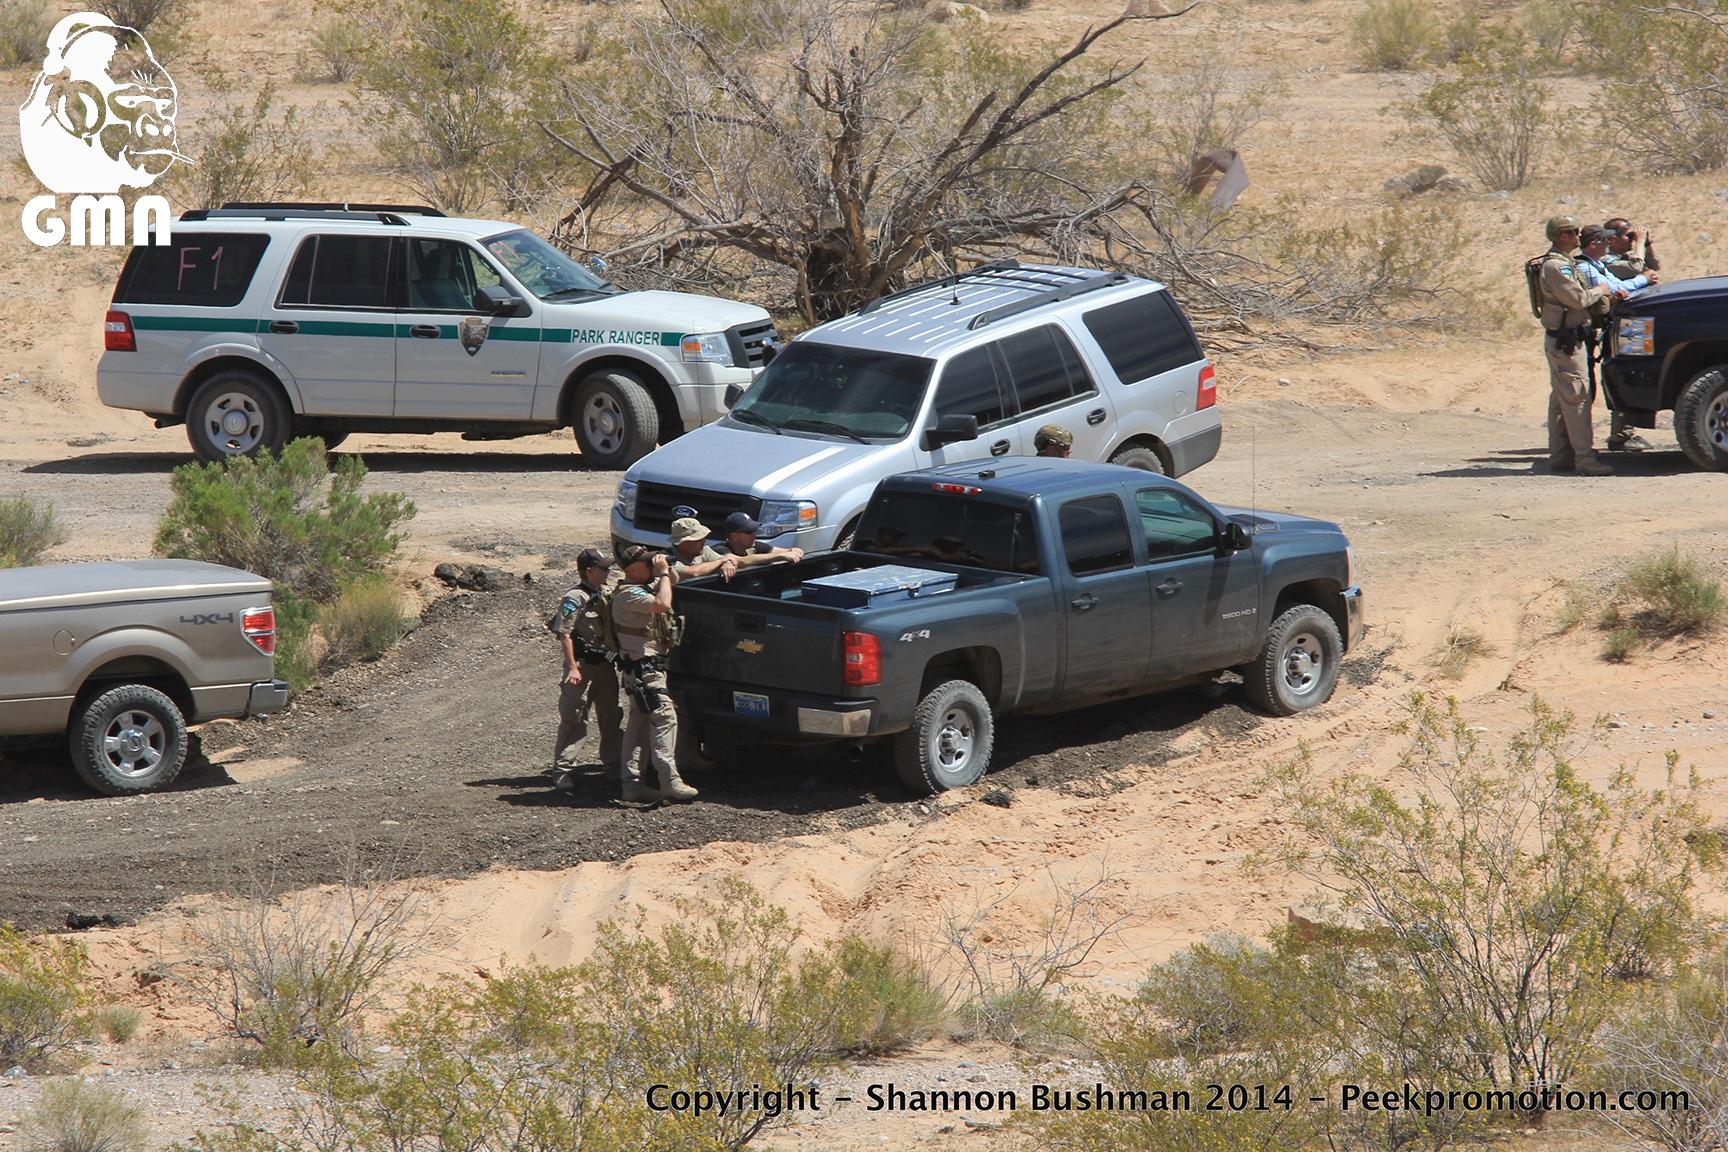 21WIREf-Bundy-Fed-Standoff-April-12-2014-Copyright-GMN